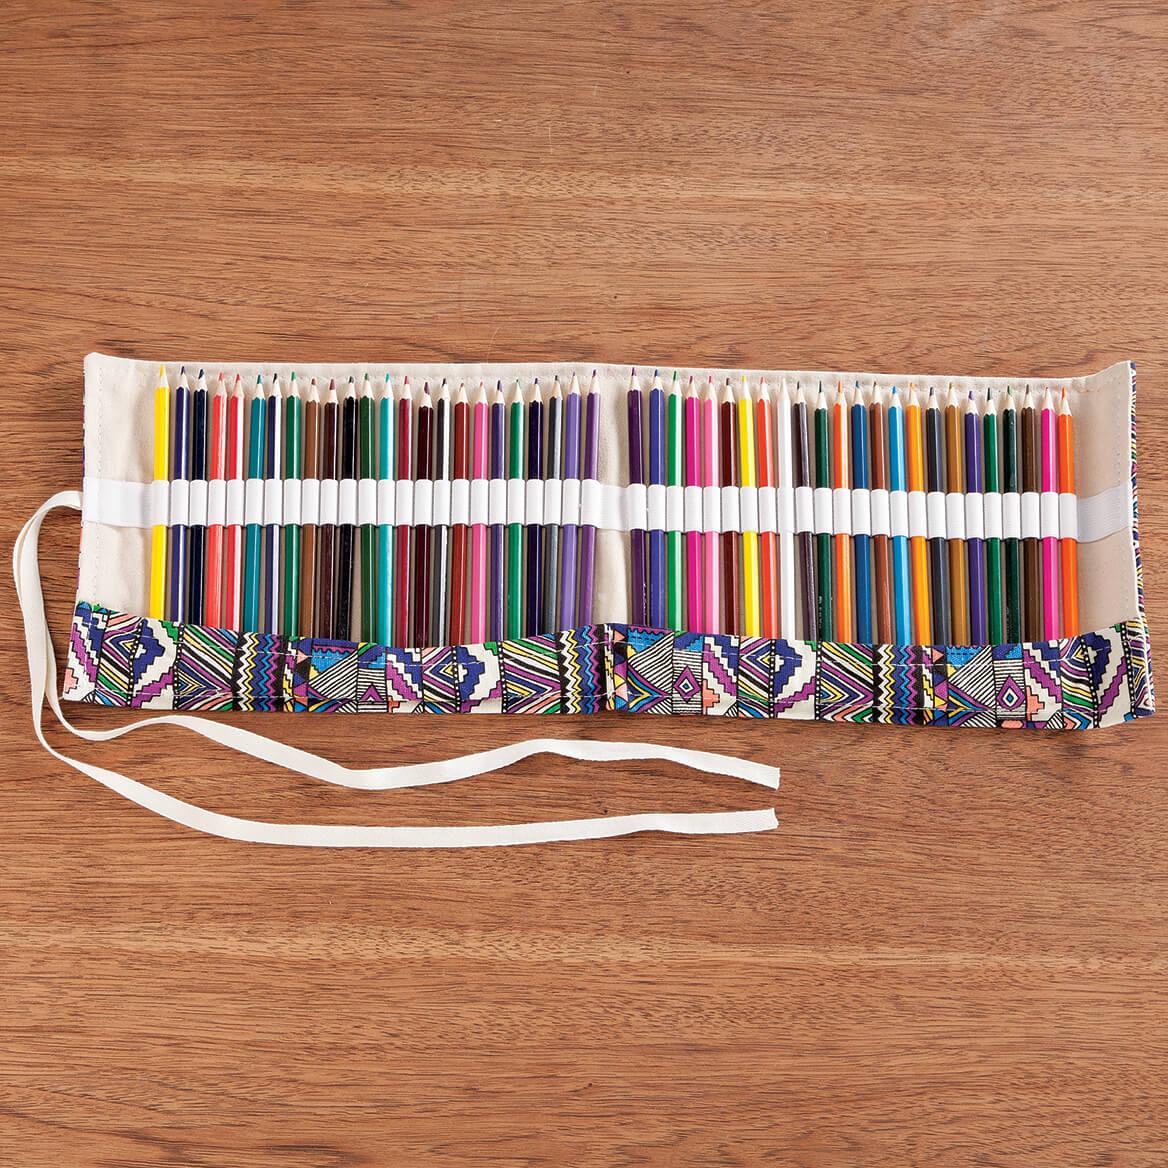 Colored Pencil Roll, 48-Piece Set-366985